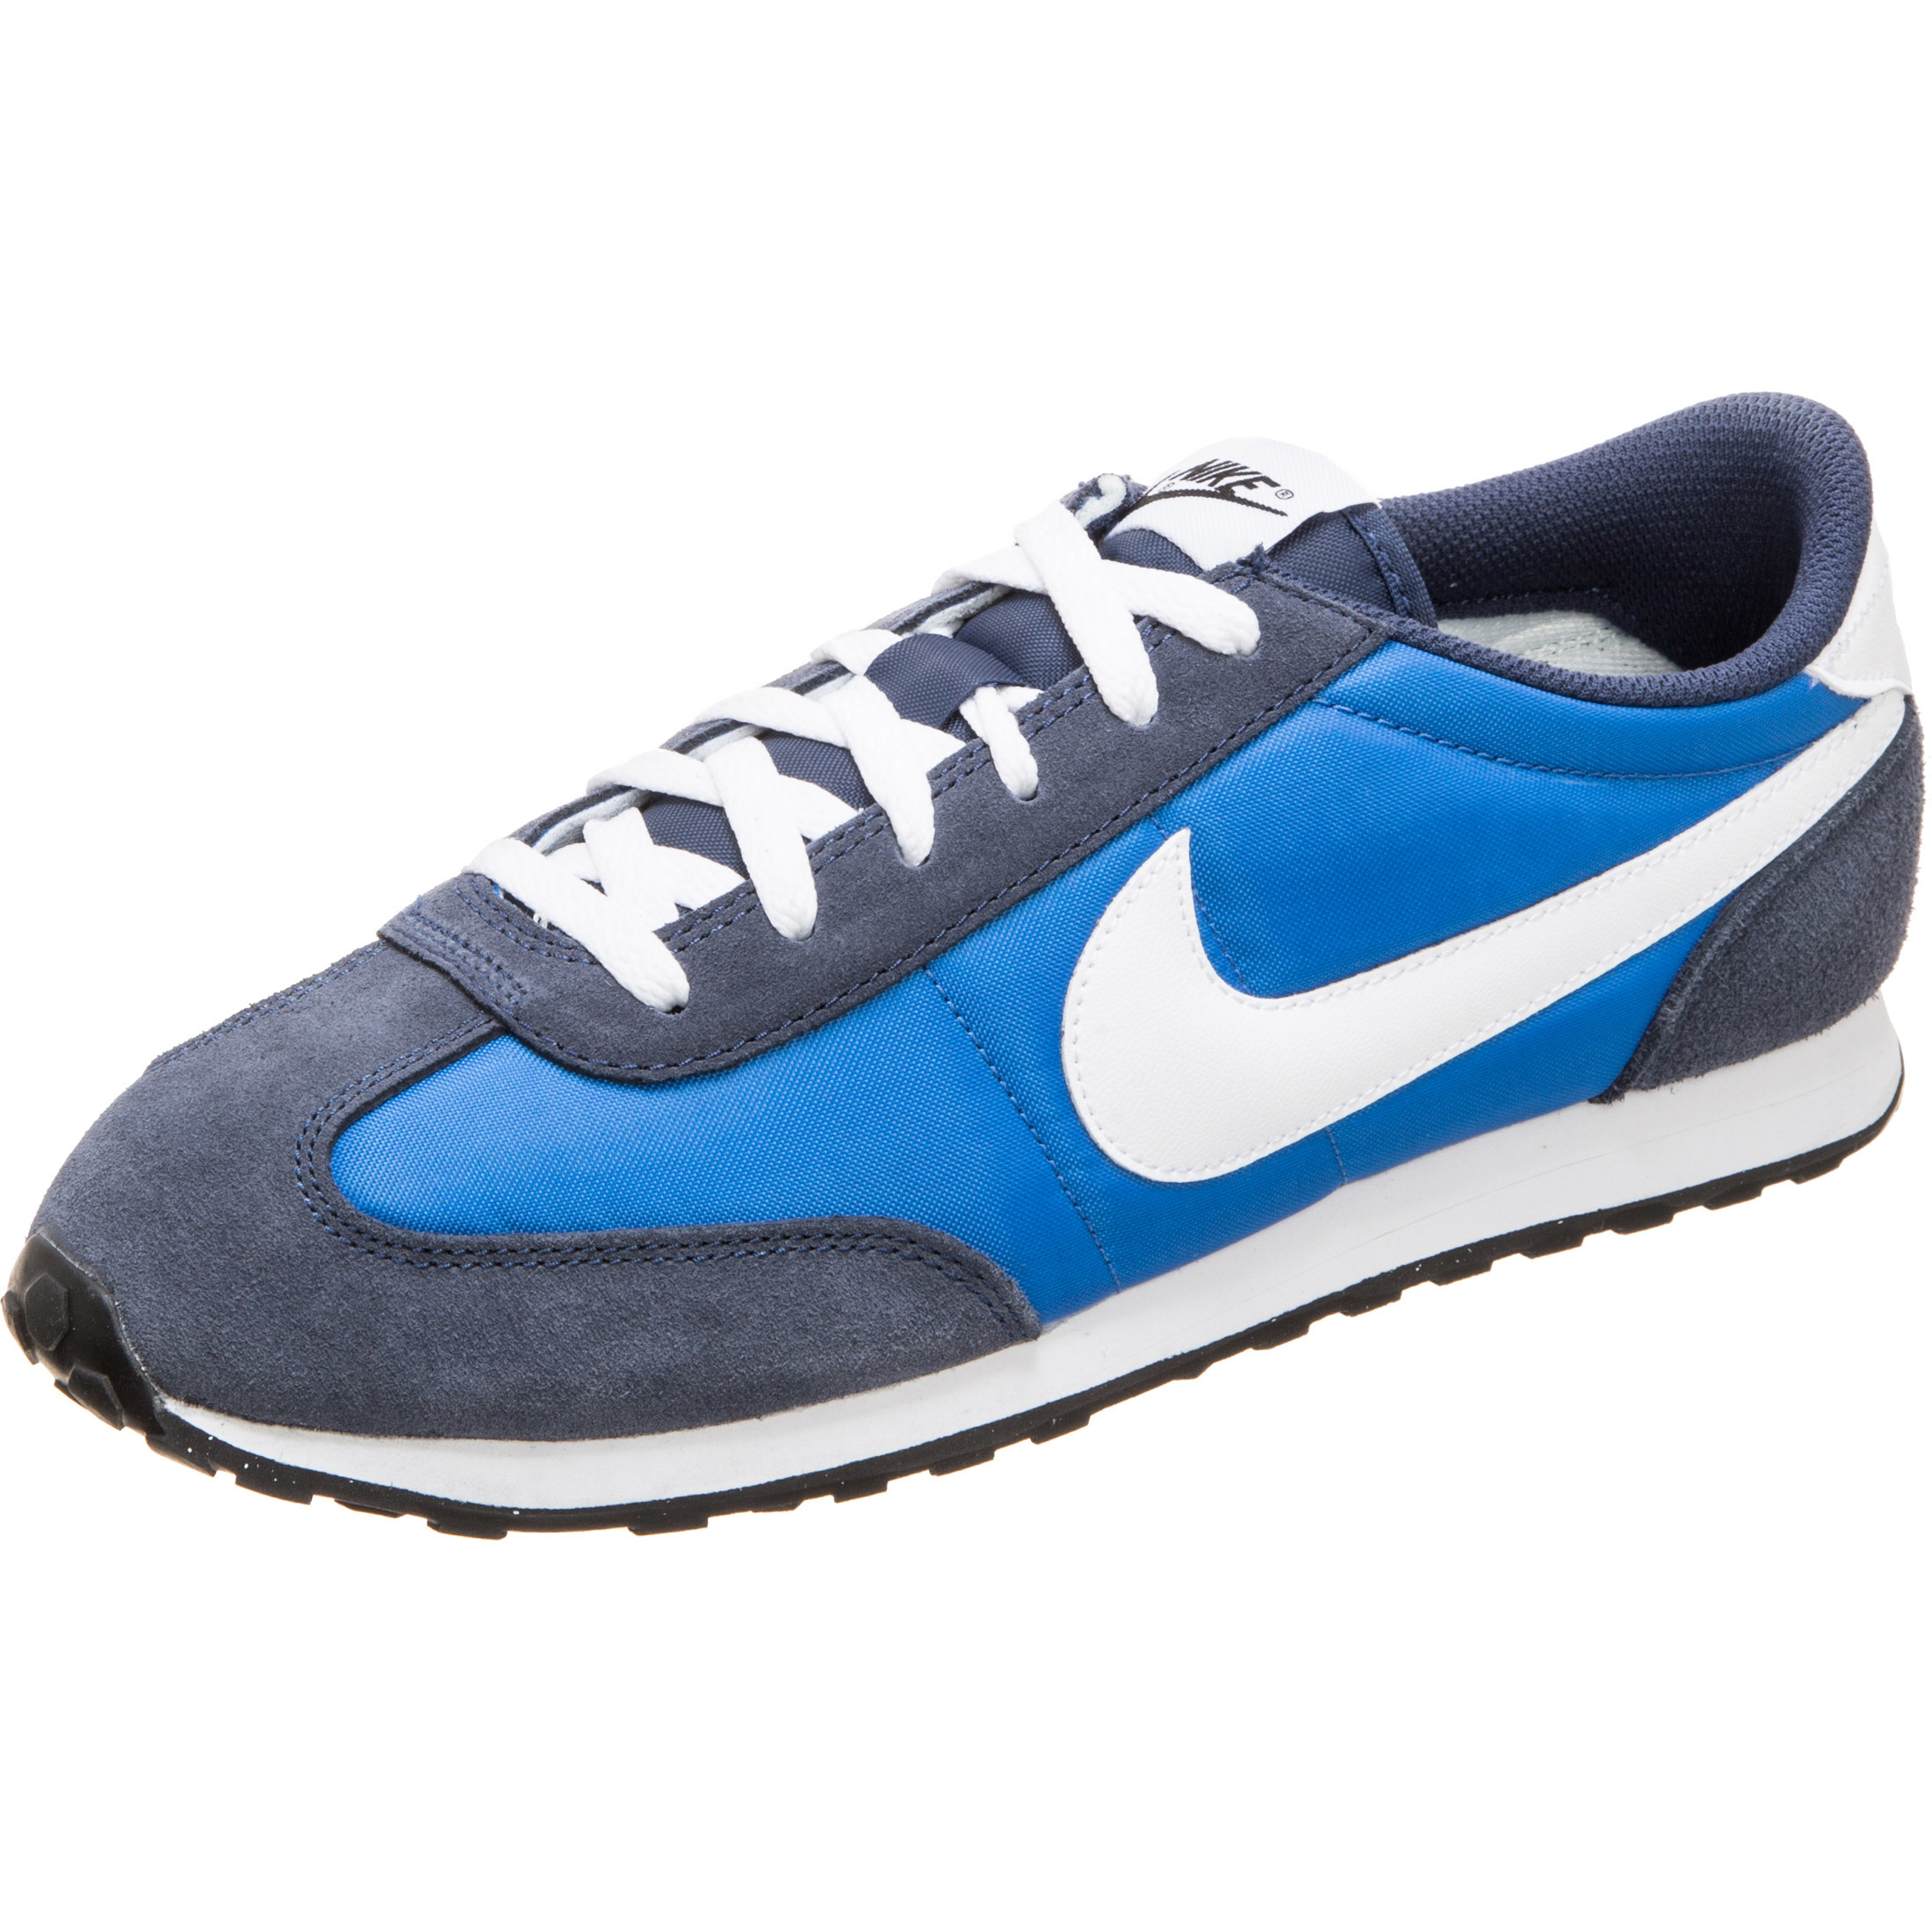 barricada Prisionero de guerra béisbol  Nike Mach Runner Men's Shoe - Blue | 303992-414 | FOOTY.COM